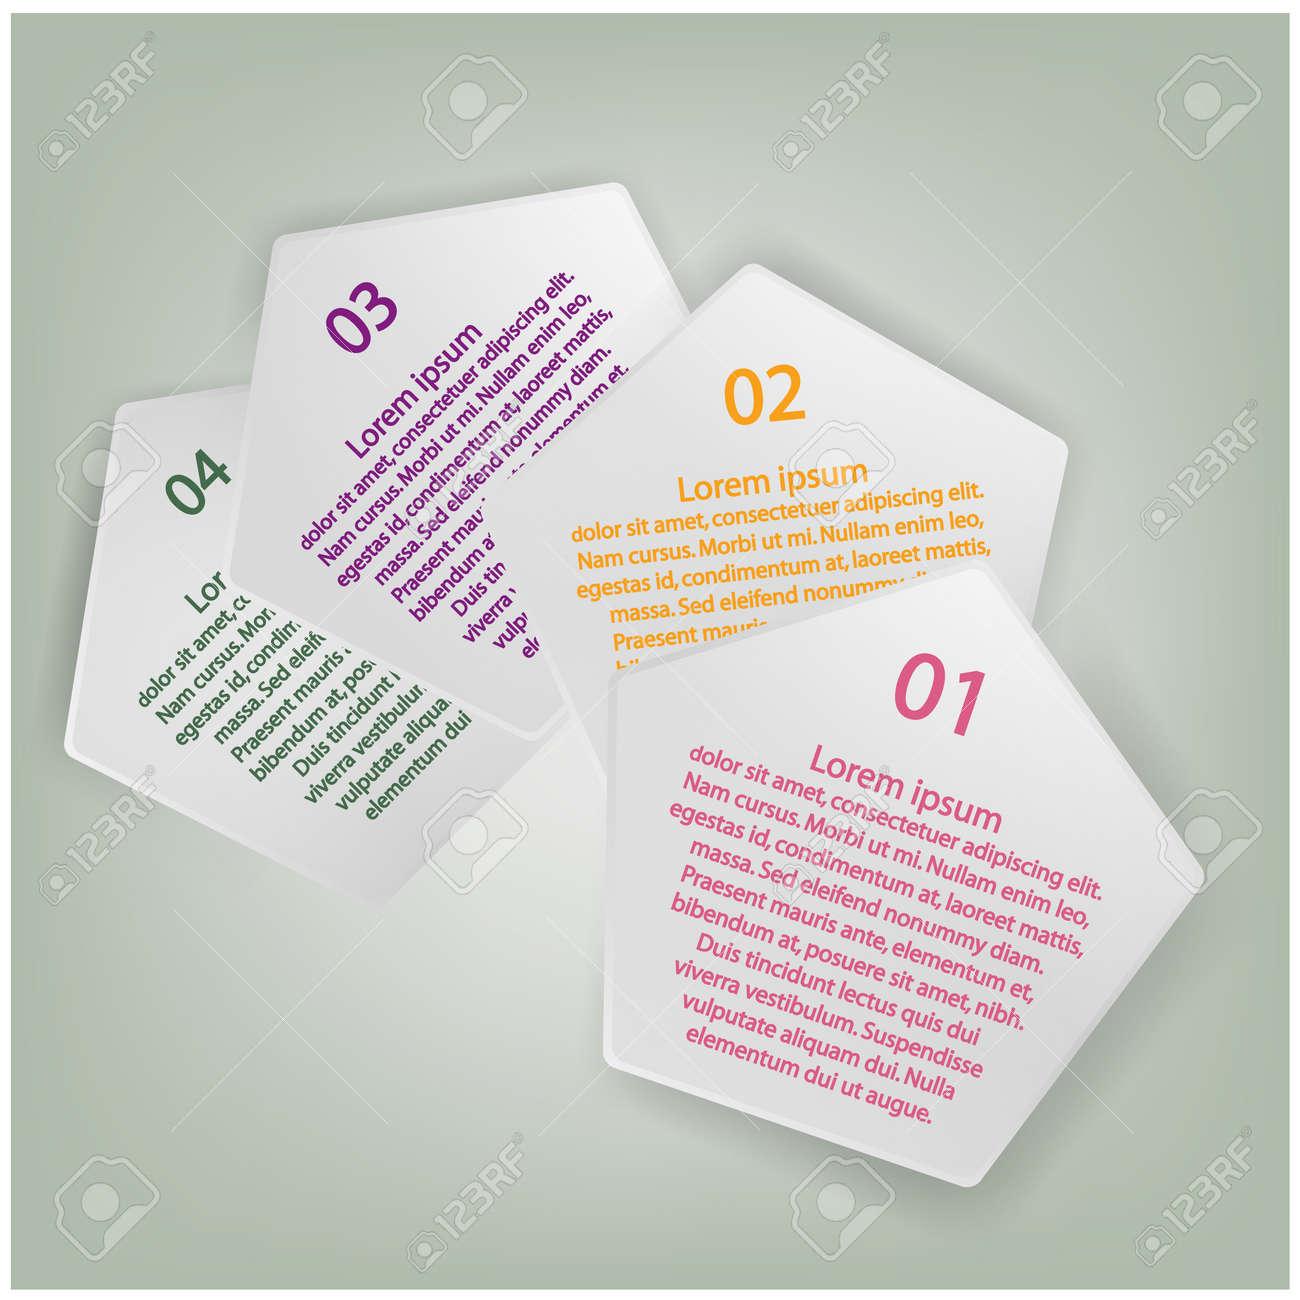 Modern Design Minimal style infographic template, presentation template ,vector illustration Stock Vector - 22124552